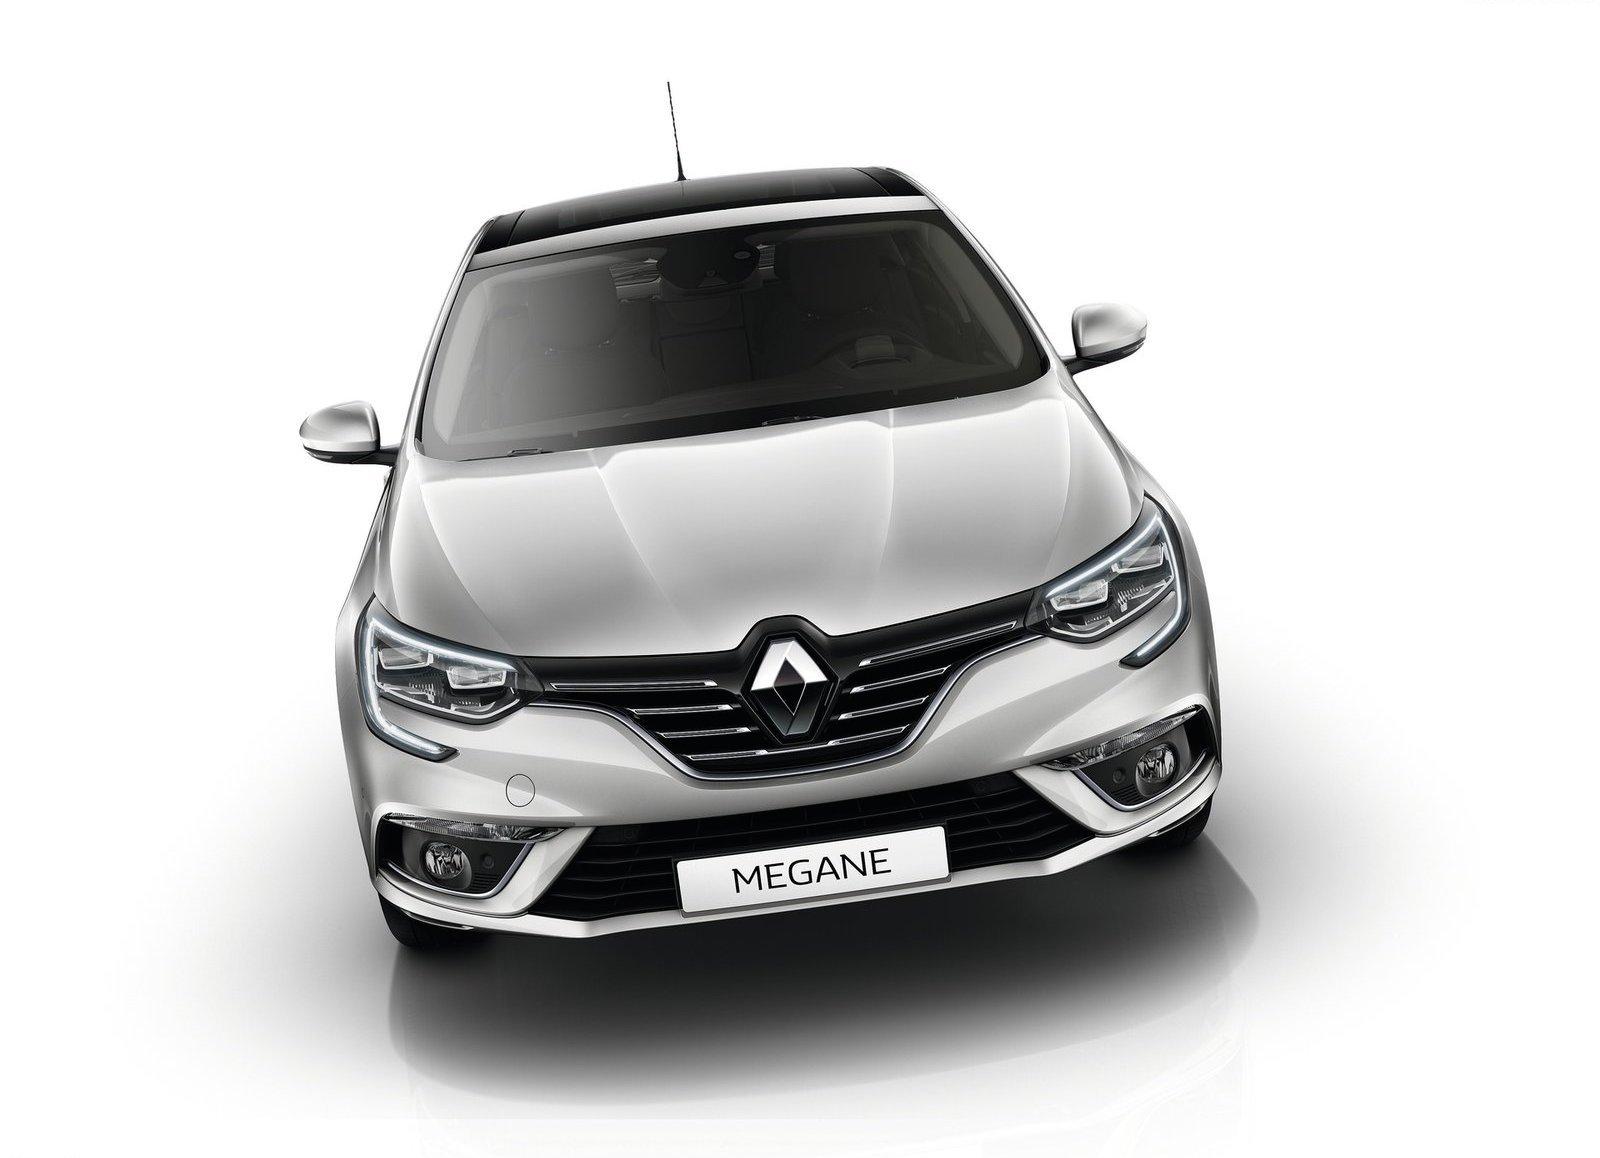 Foto de Renault Mégane 2016 (11/52)